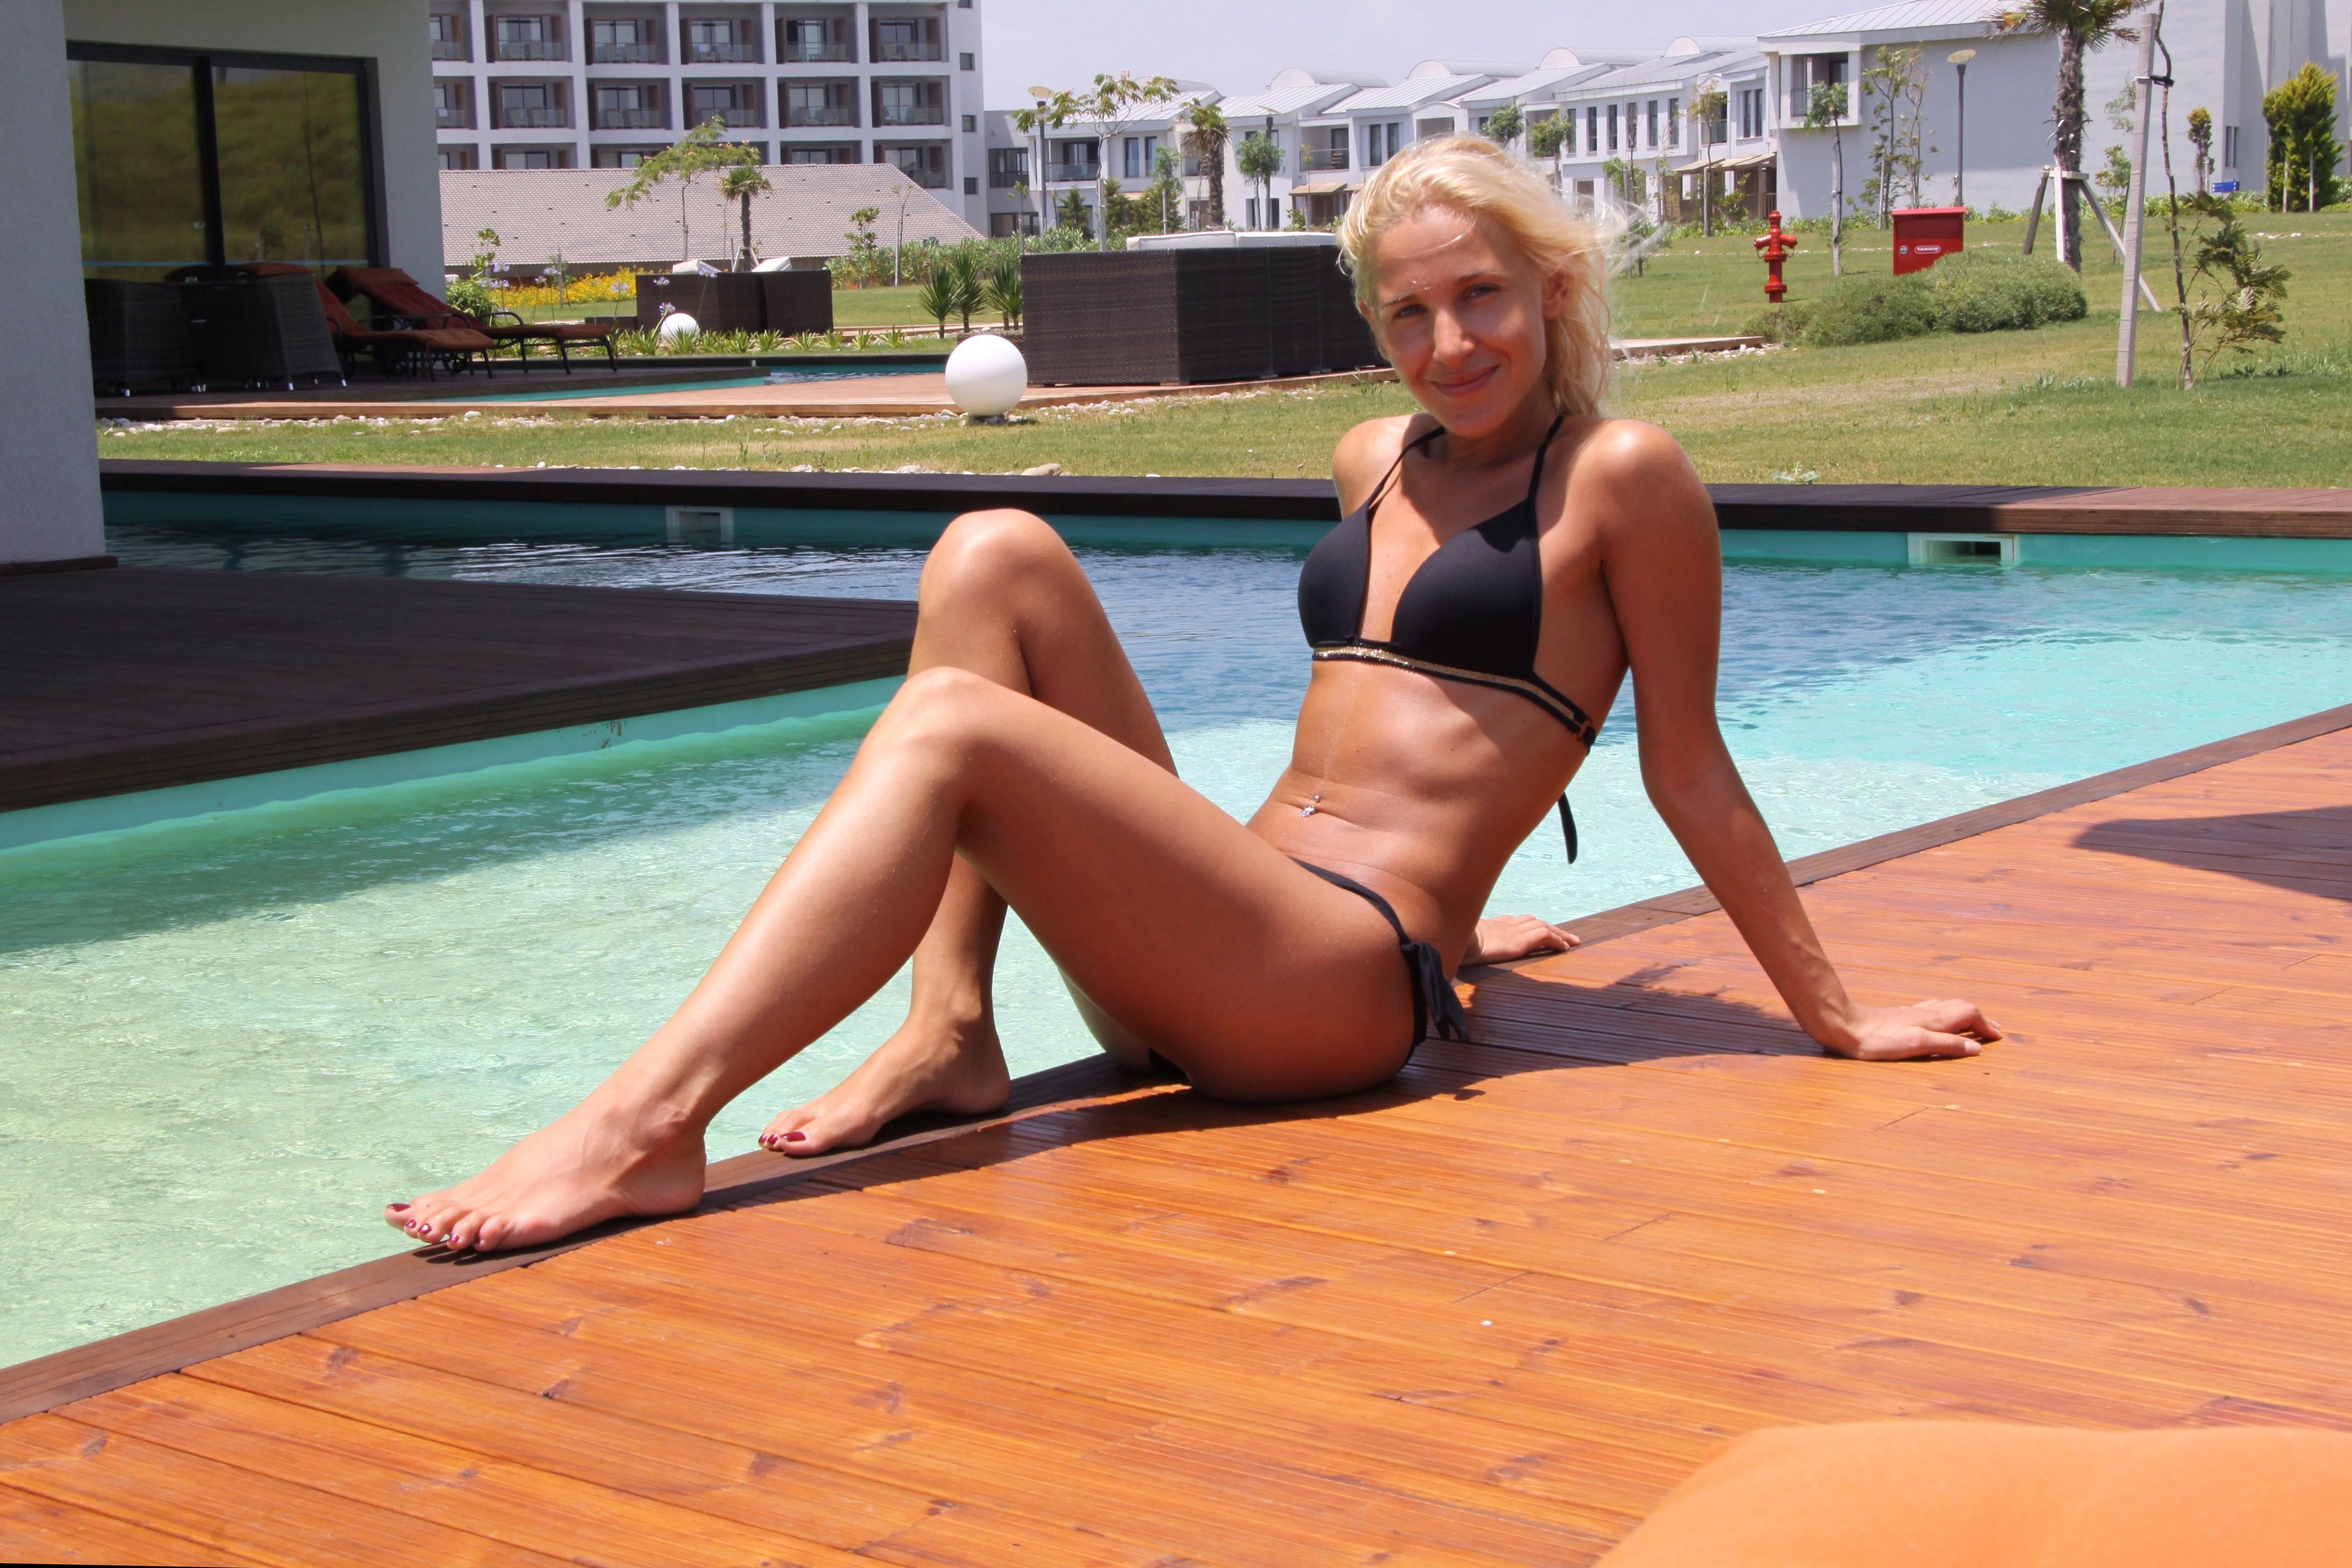 Images Julia Kovalchuk naked (93 photo), Topless, Sideboobs, Boobs, lingerie 2020